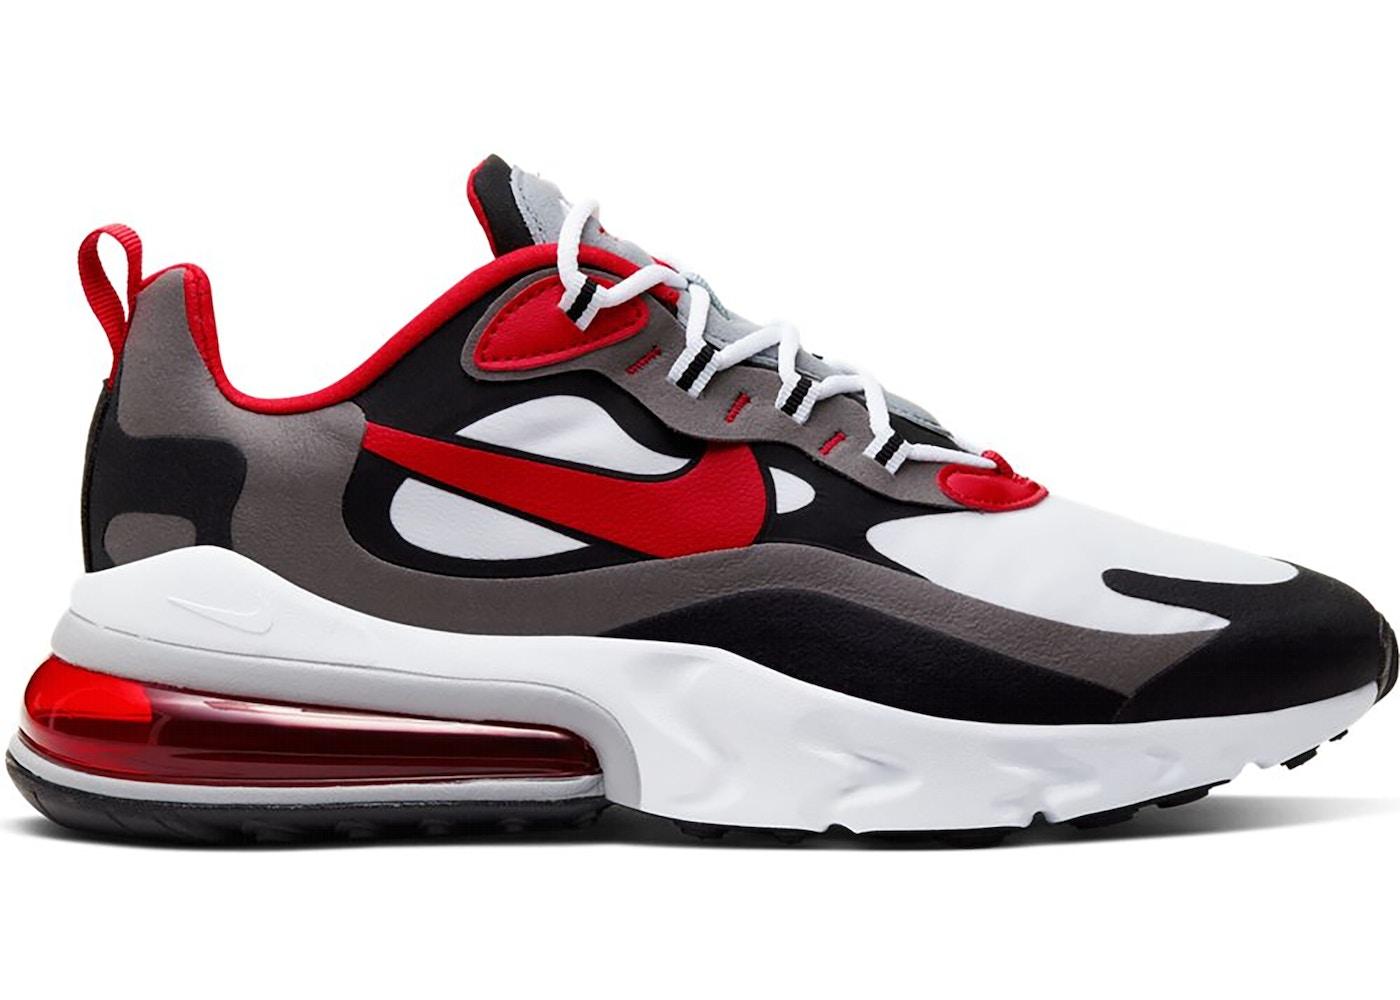 Nike Air Max 270 React Black Iron Grey University Red Ci3866 002